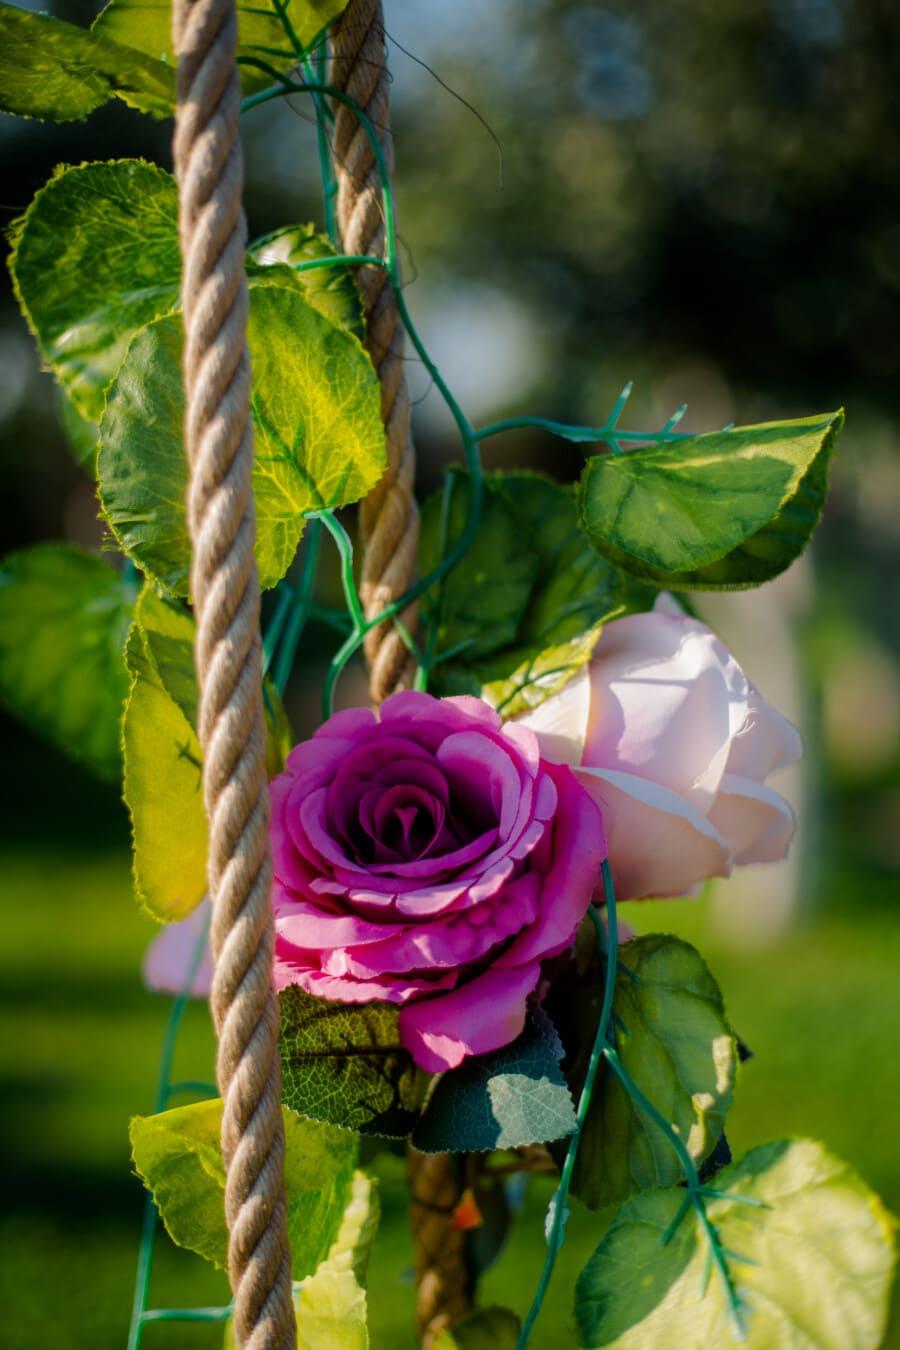 rose, plastic, pinkish, rope, decoration, arrangement, flower, leaf, bouquet, garden